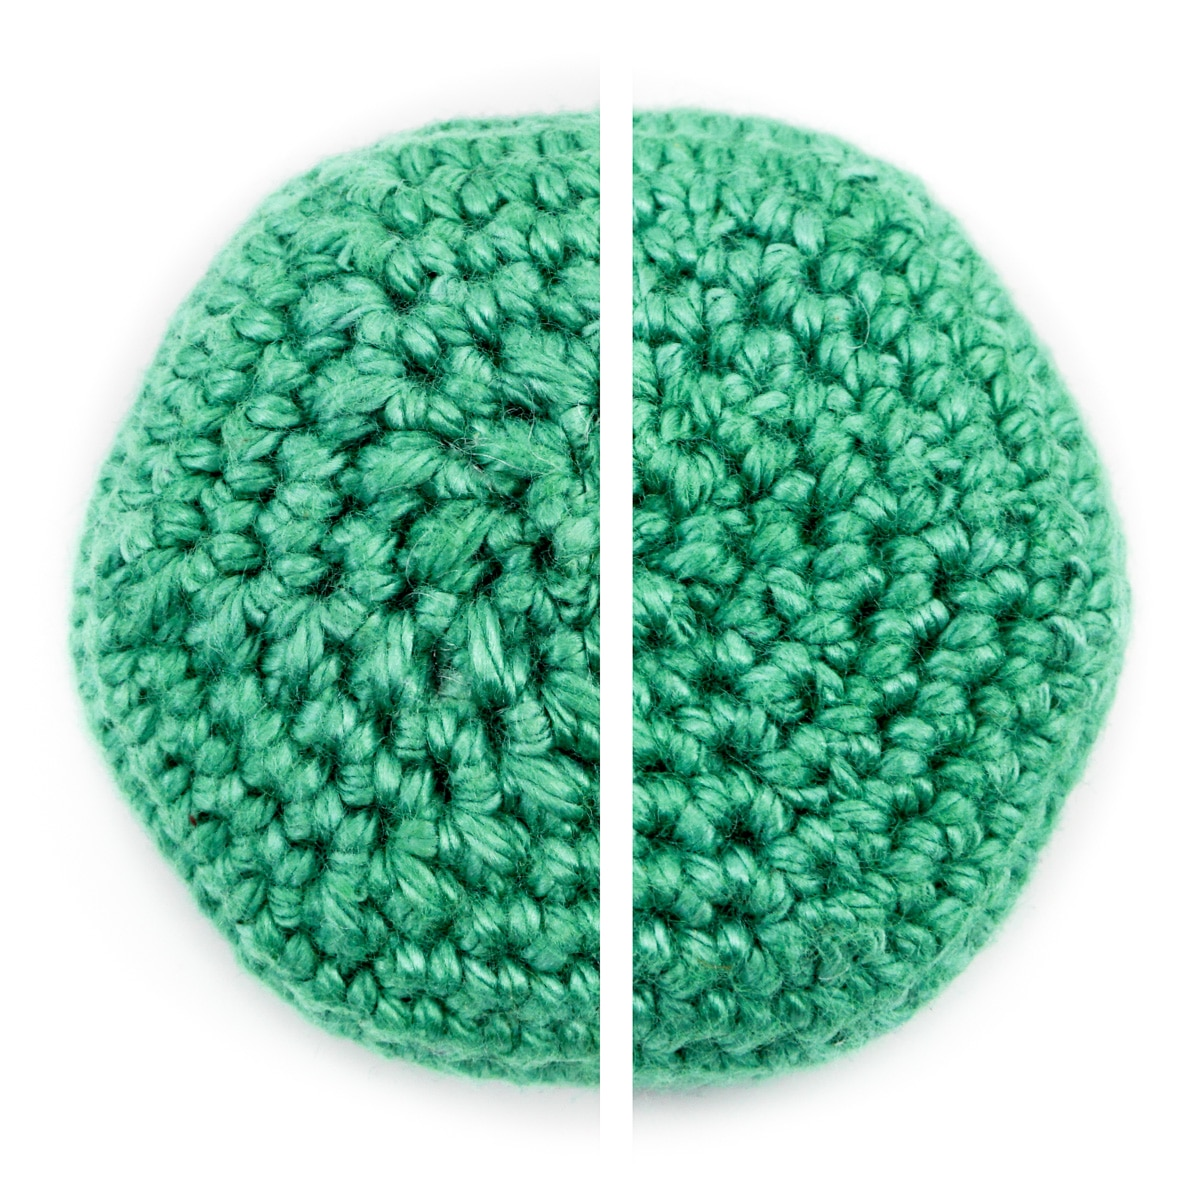 How To Crochet Single Crochet Invisible Decrease - Crochet 365 ... | 1200x1200